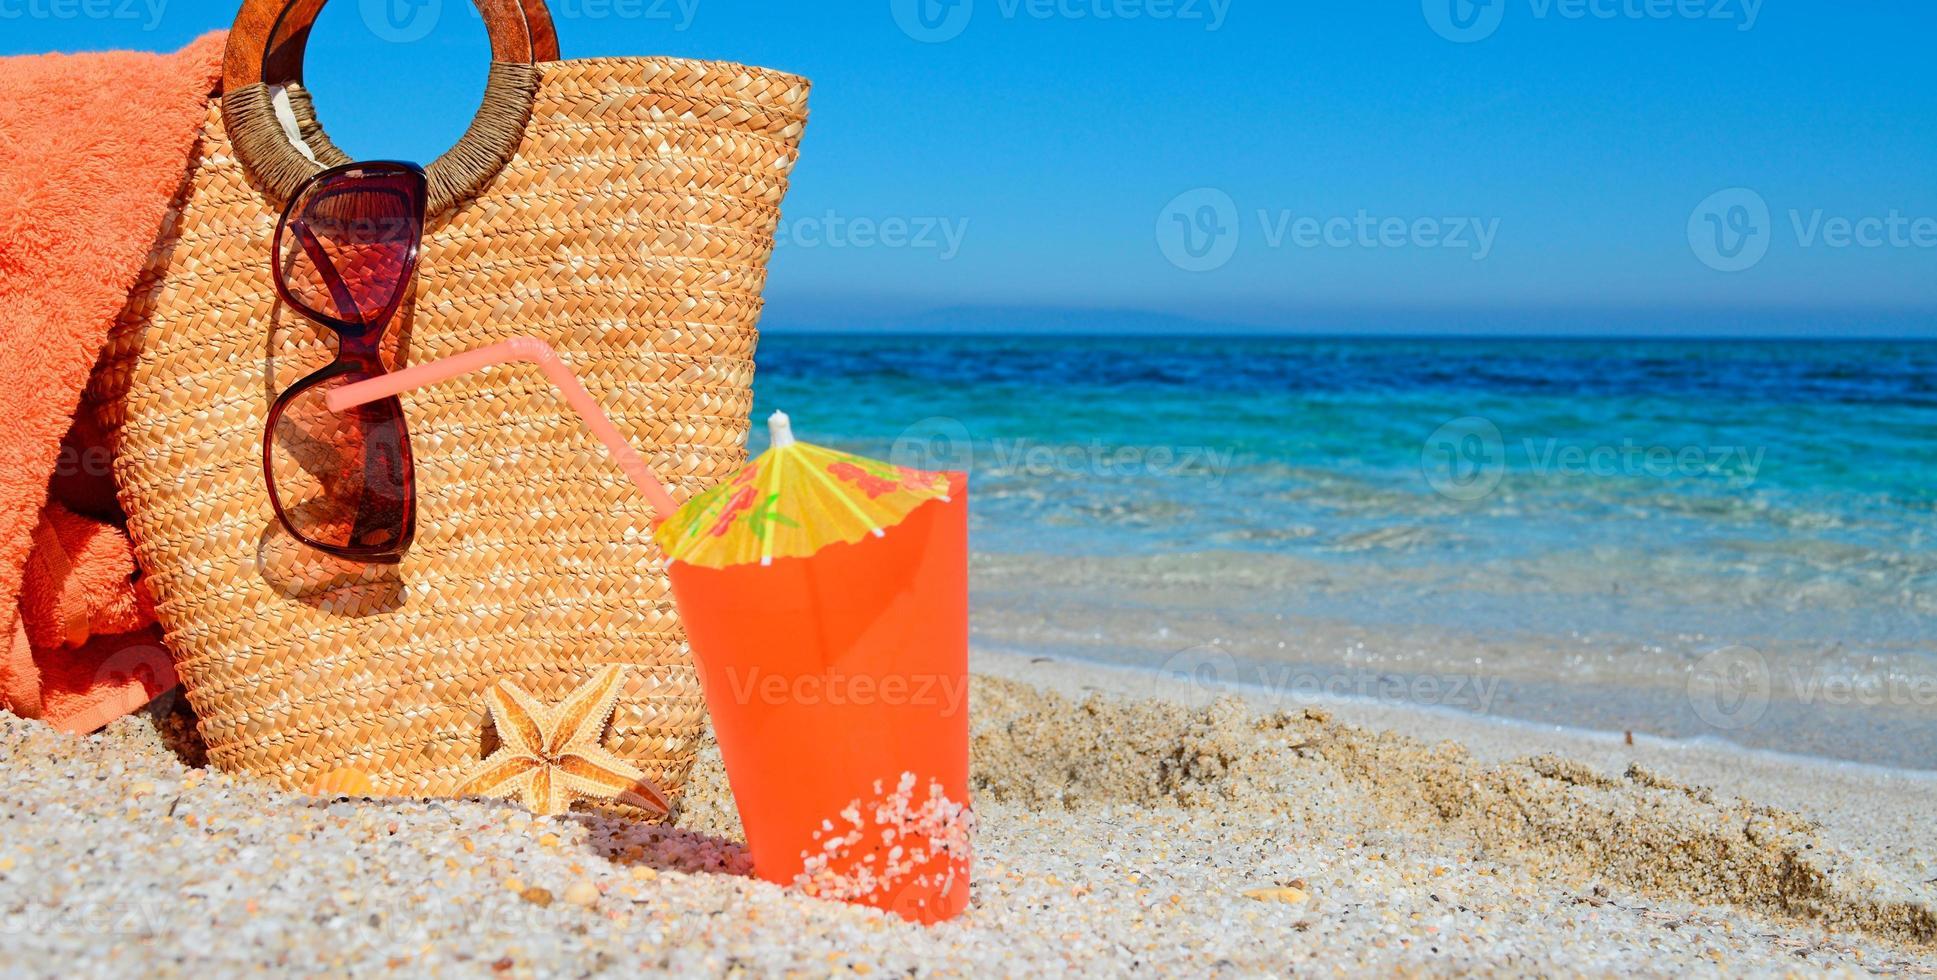 bebida de naranja y bolsa foto